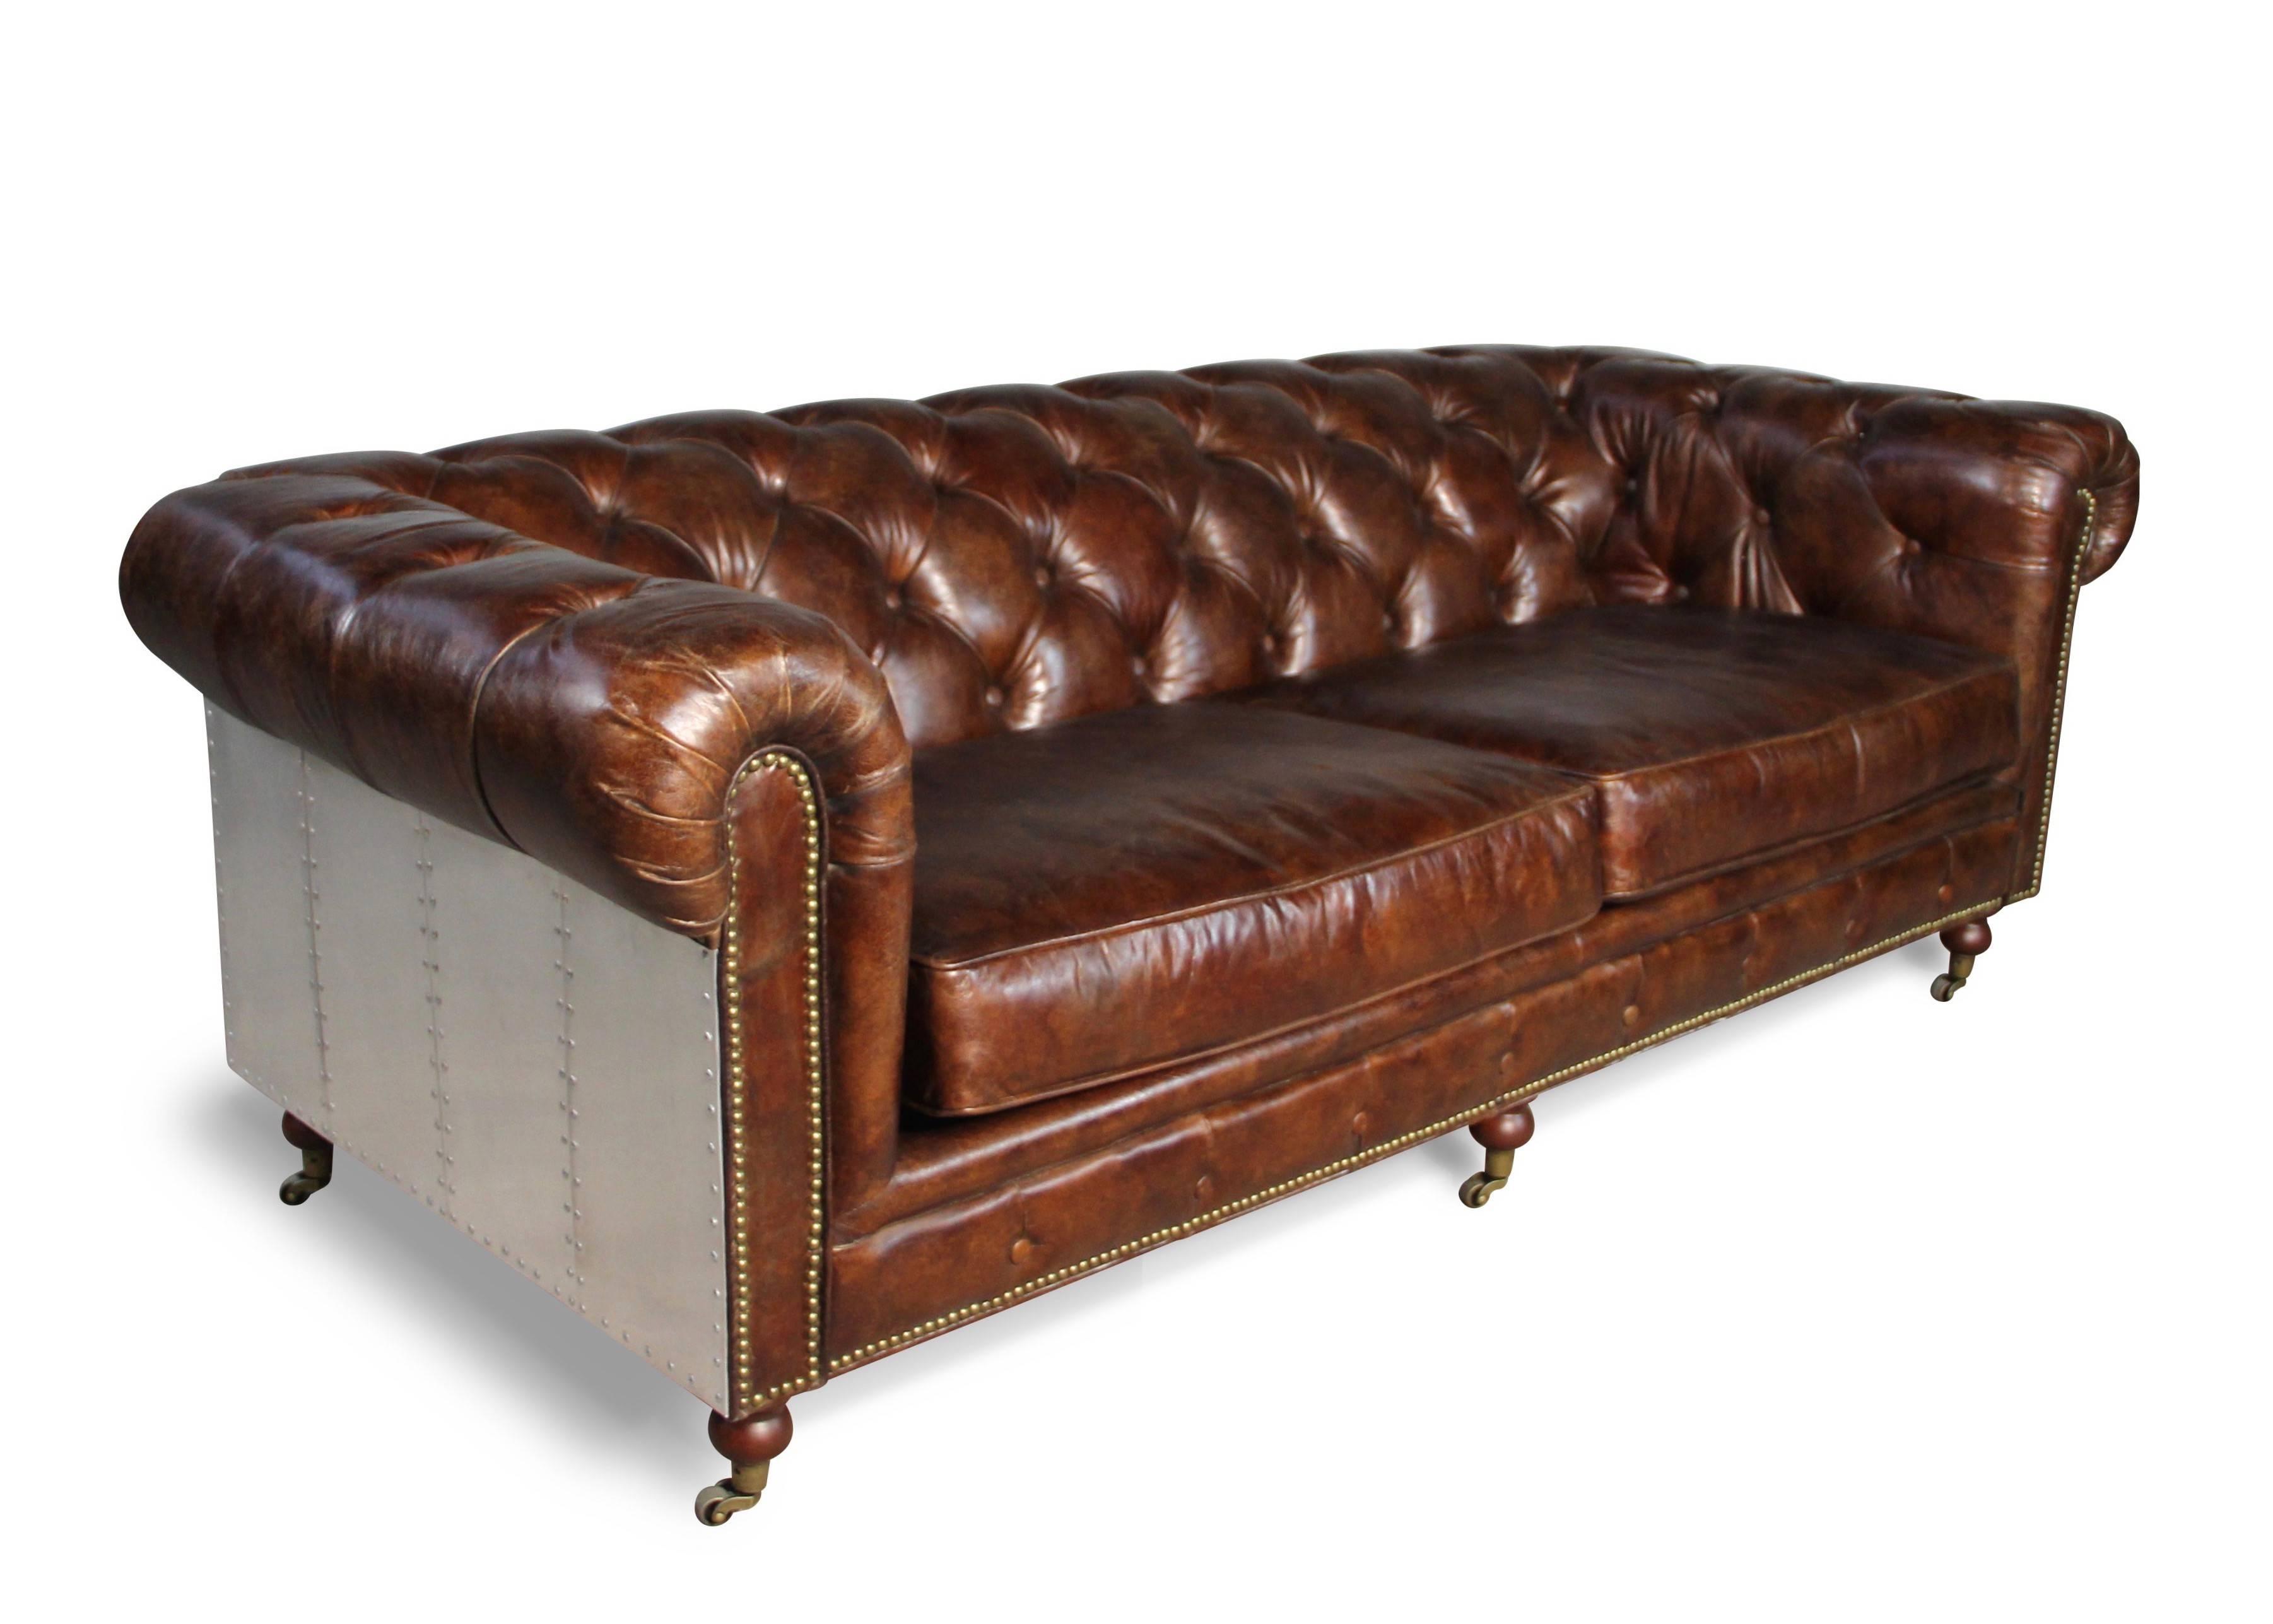 Sofa Chesterfield In Patina Braun Vintage Leder Und Aluminium 3 Sitze